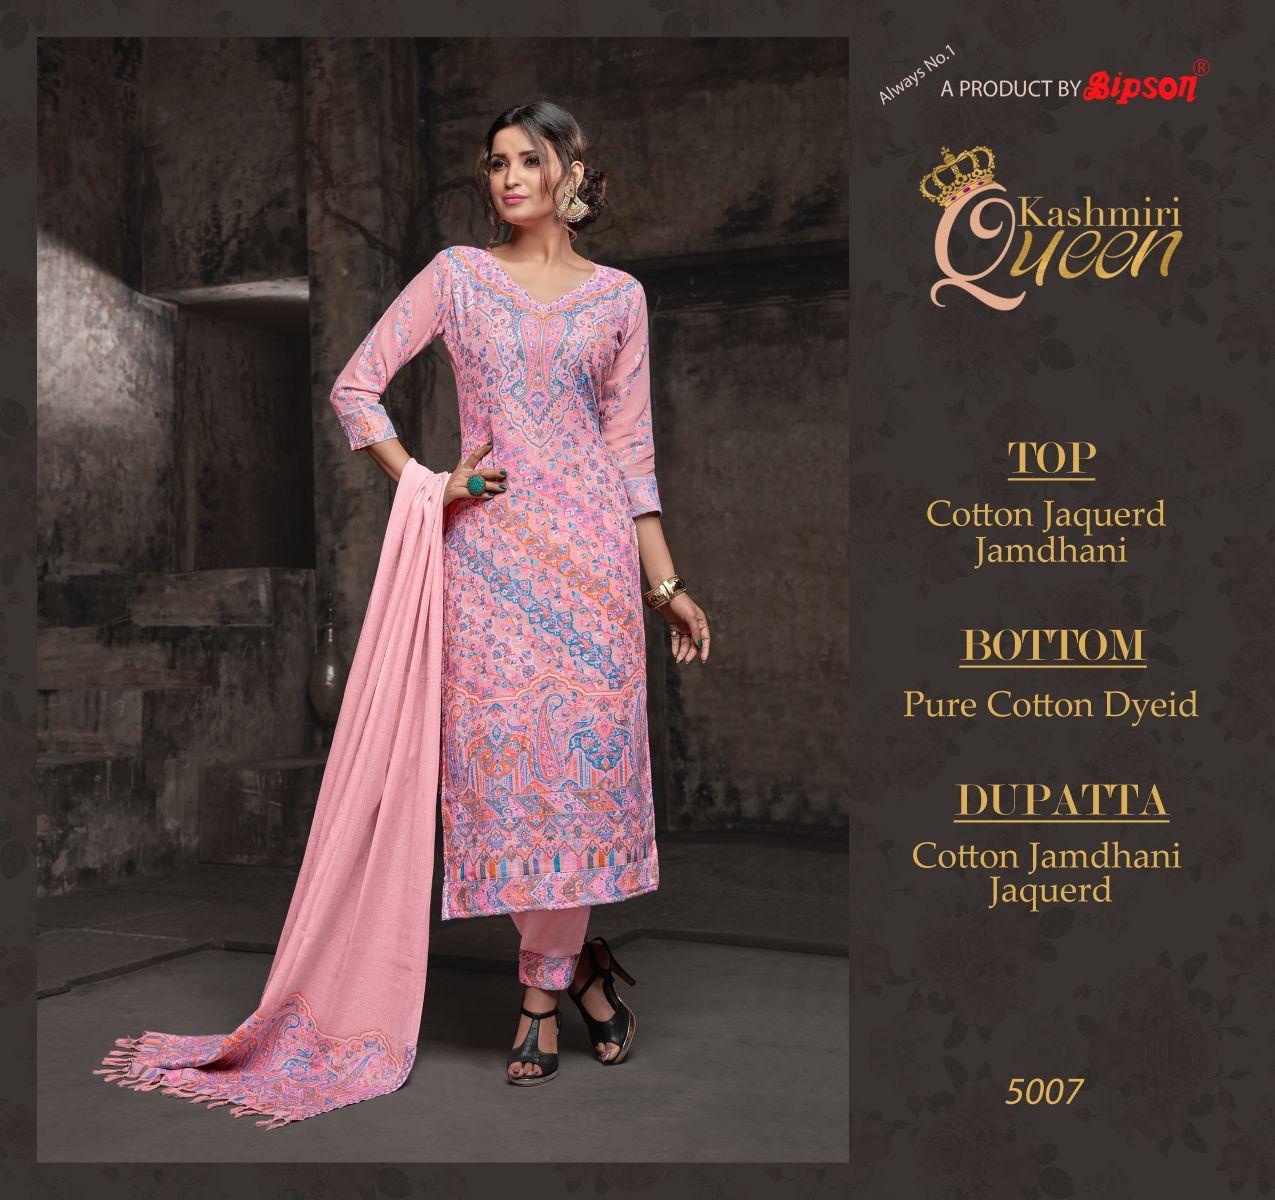 Bipson Kashmiri Queen 5007